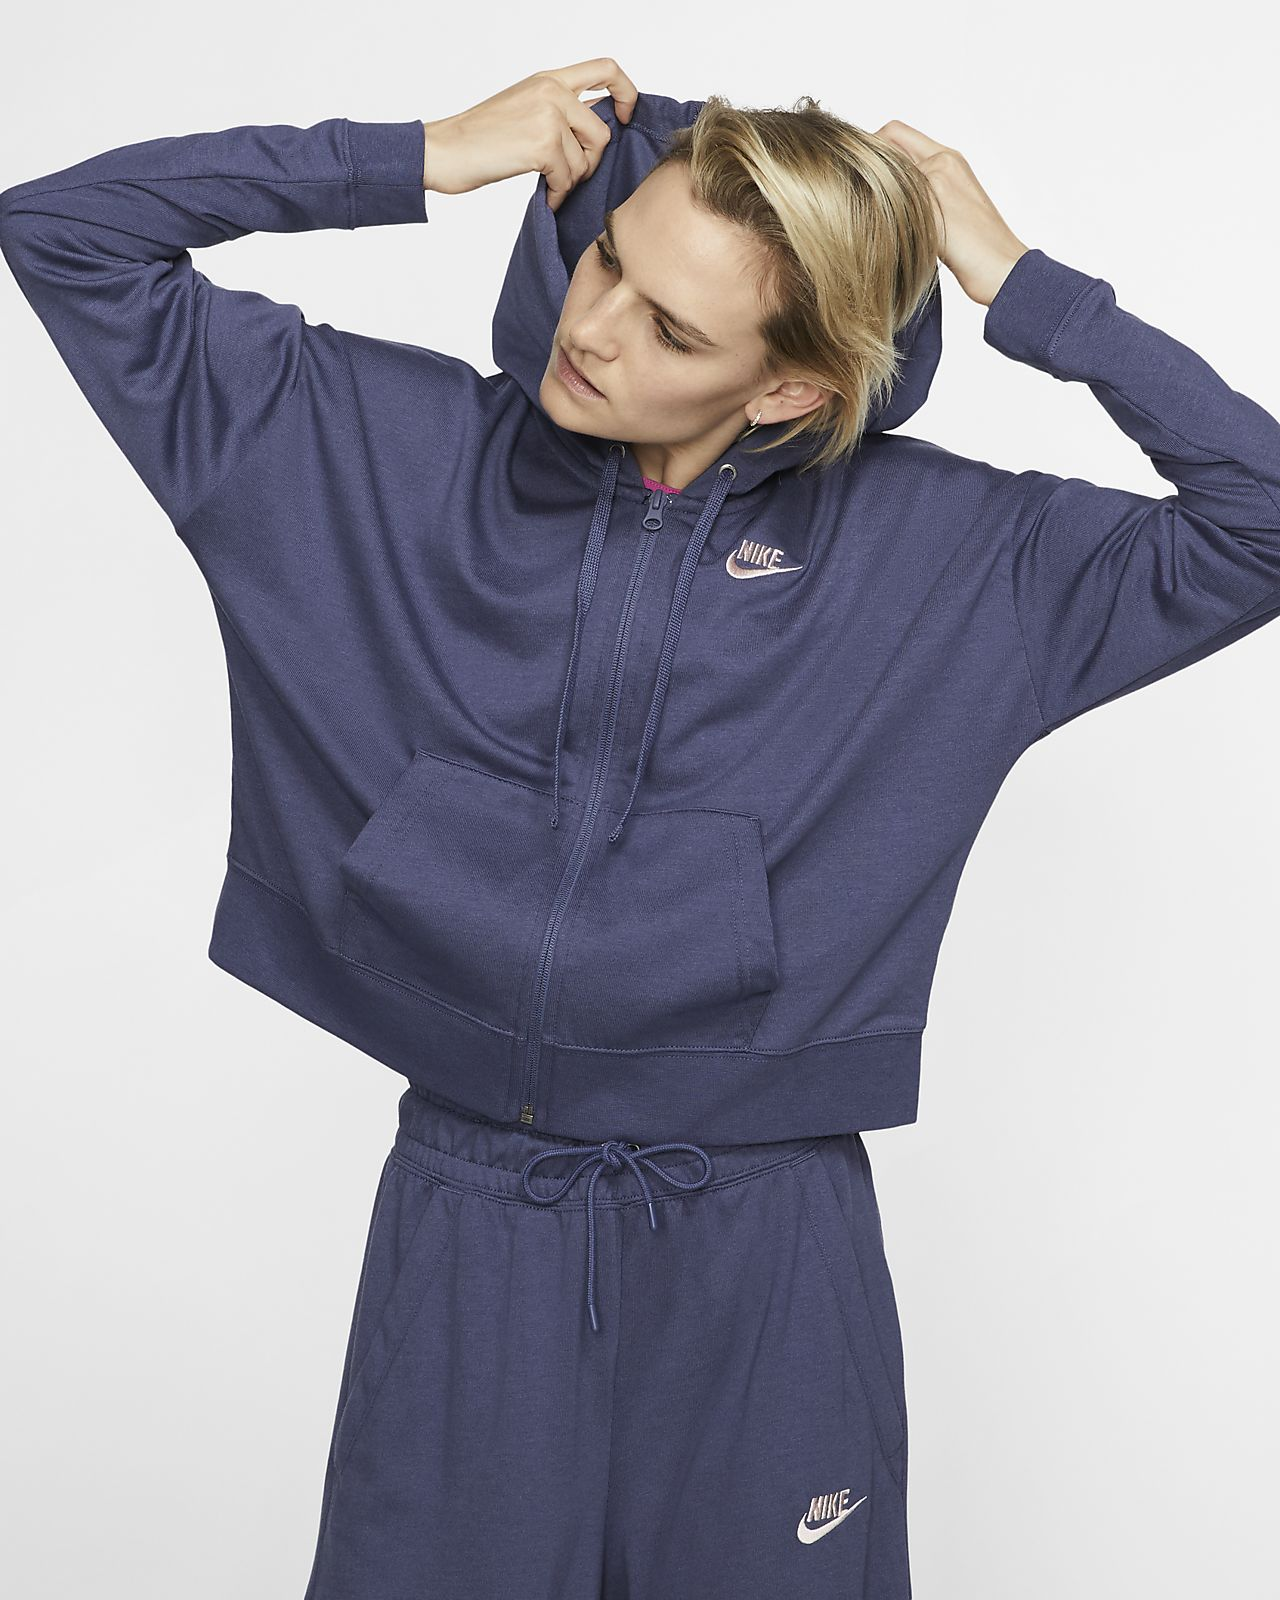 Женская худи с молнией во всю длину Nike Sportswear